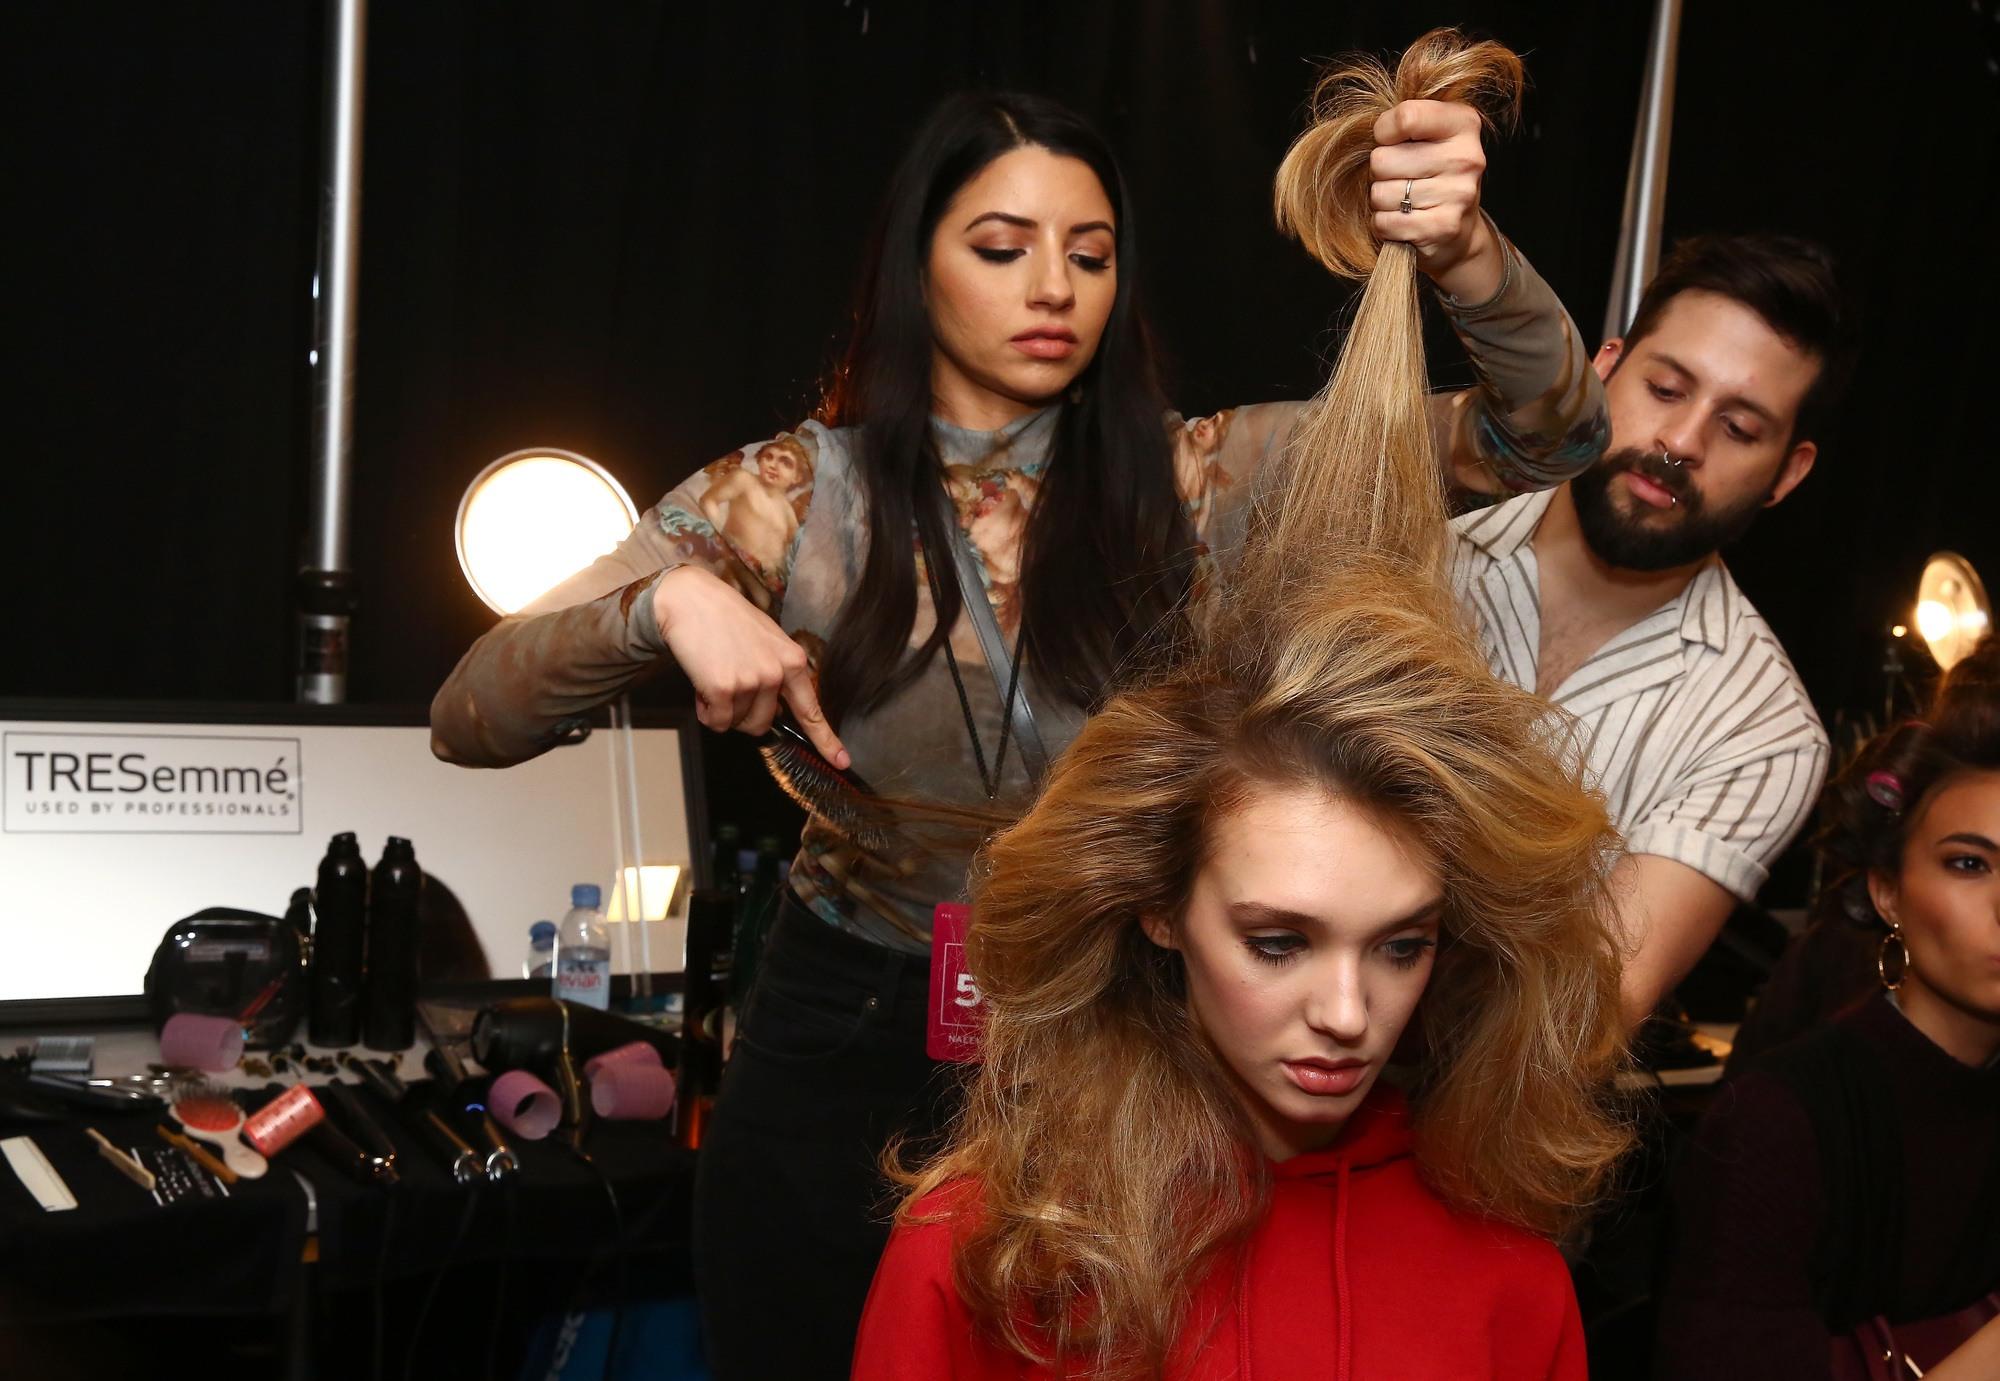 70s hair: Justine Marjan teasing hair for volume